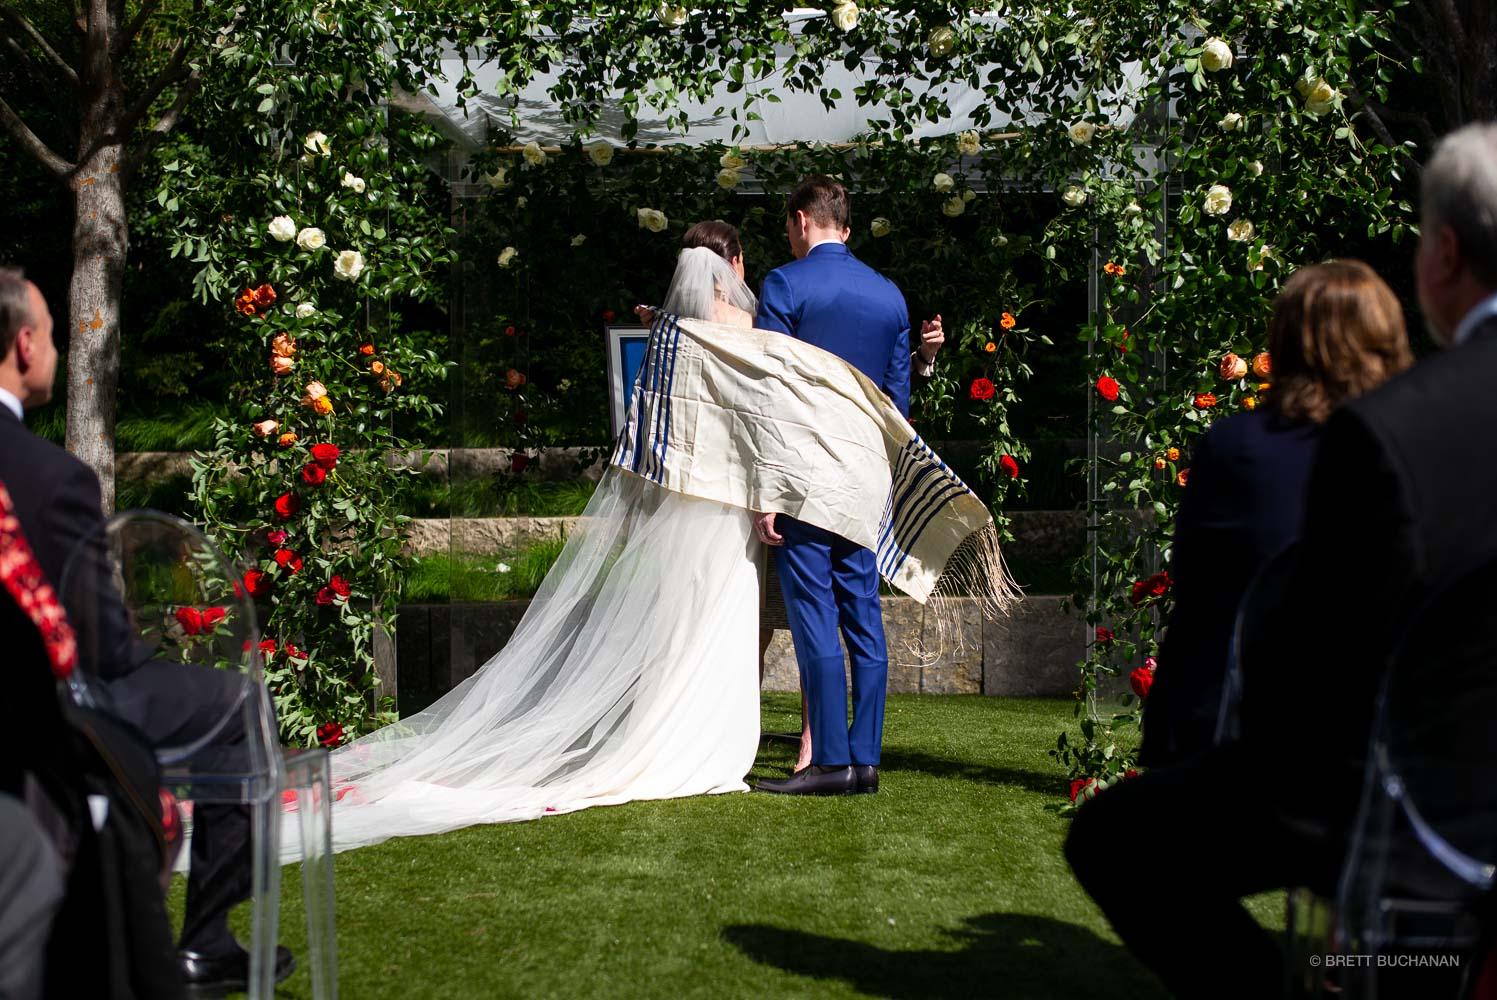 Austin-wedding-photographer-dallas-eyeball-joule-35